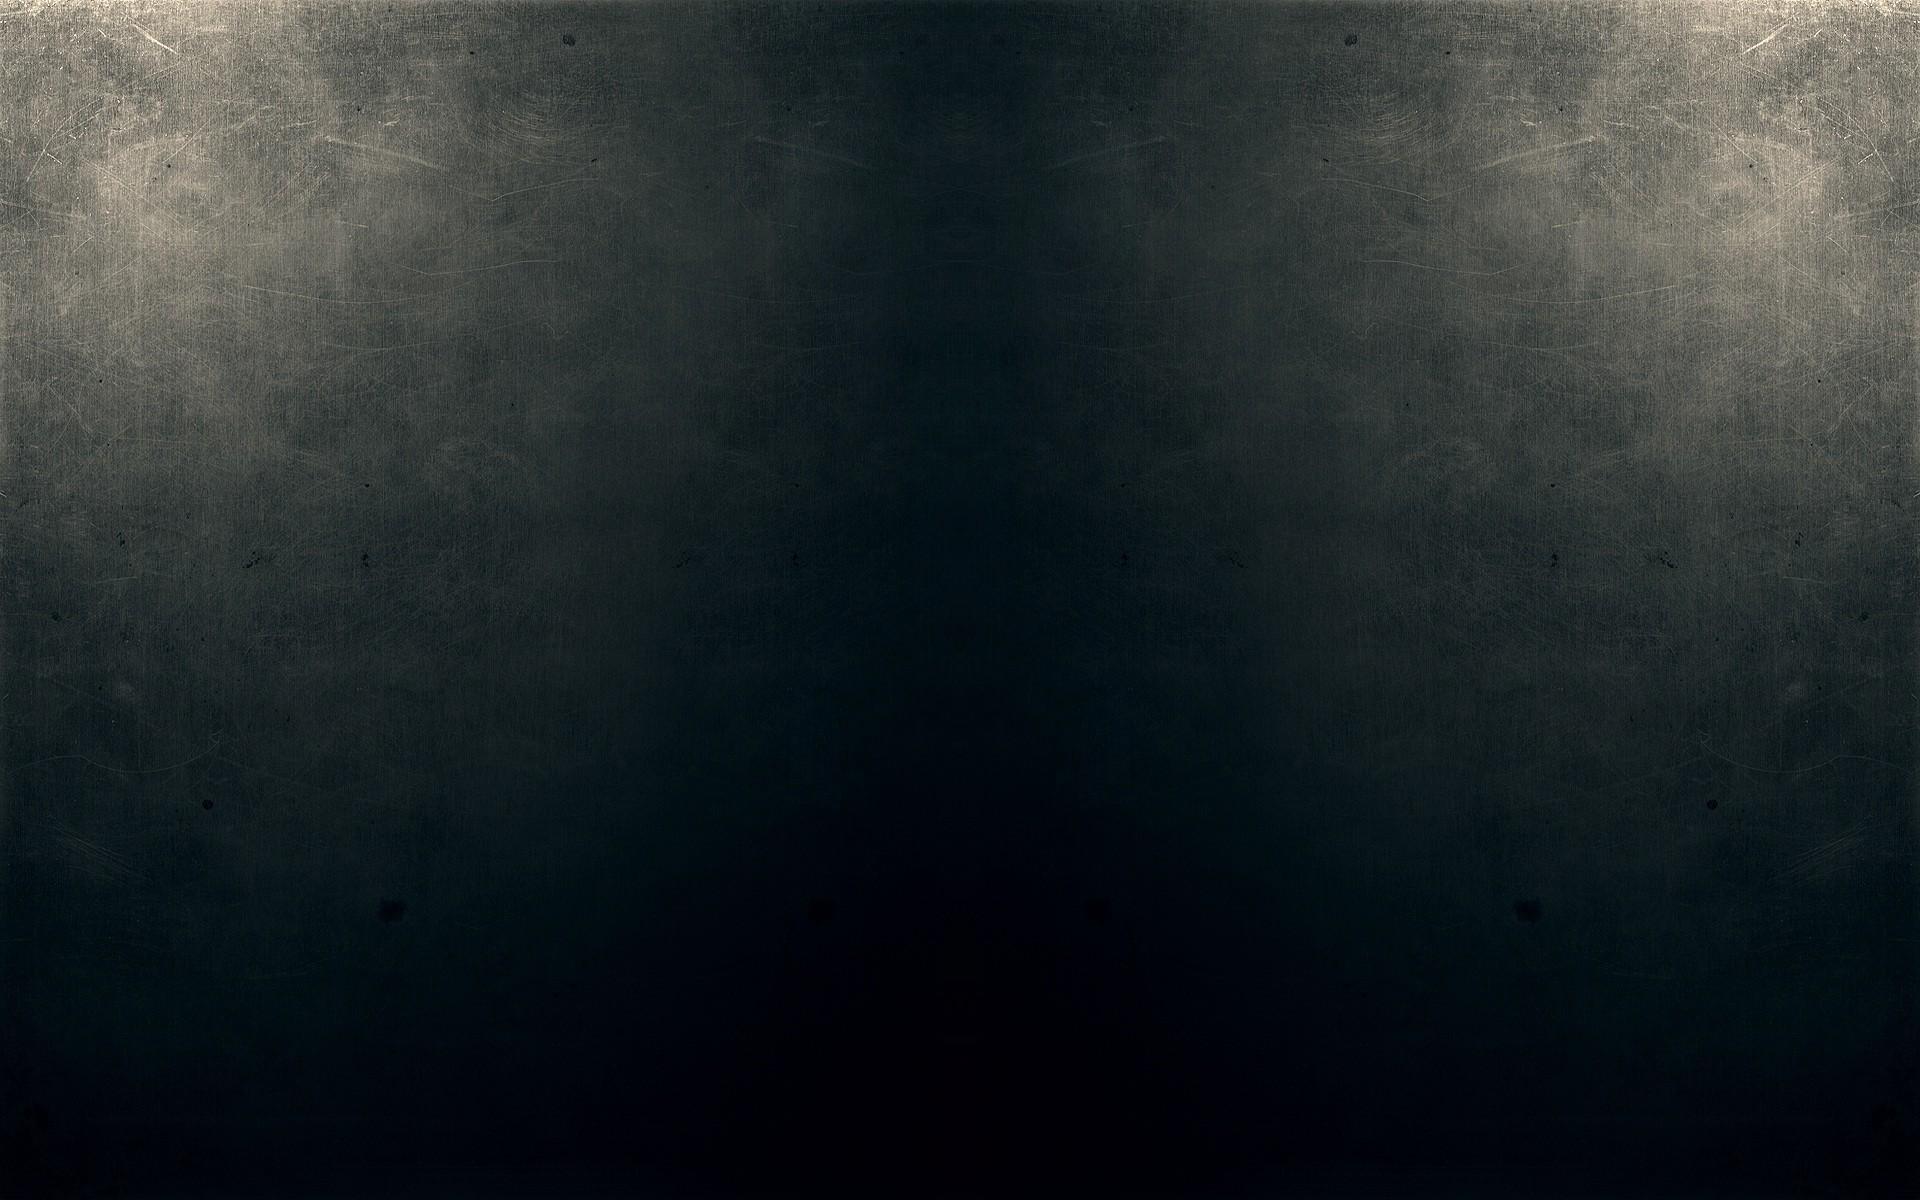 Alien Background wallpaper – 272040